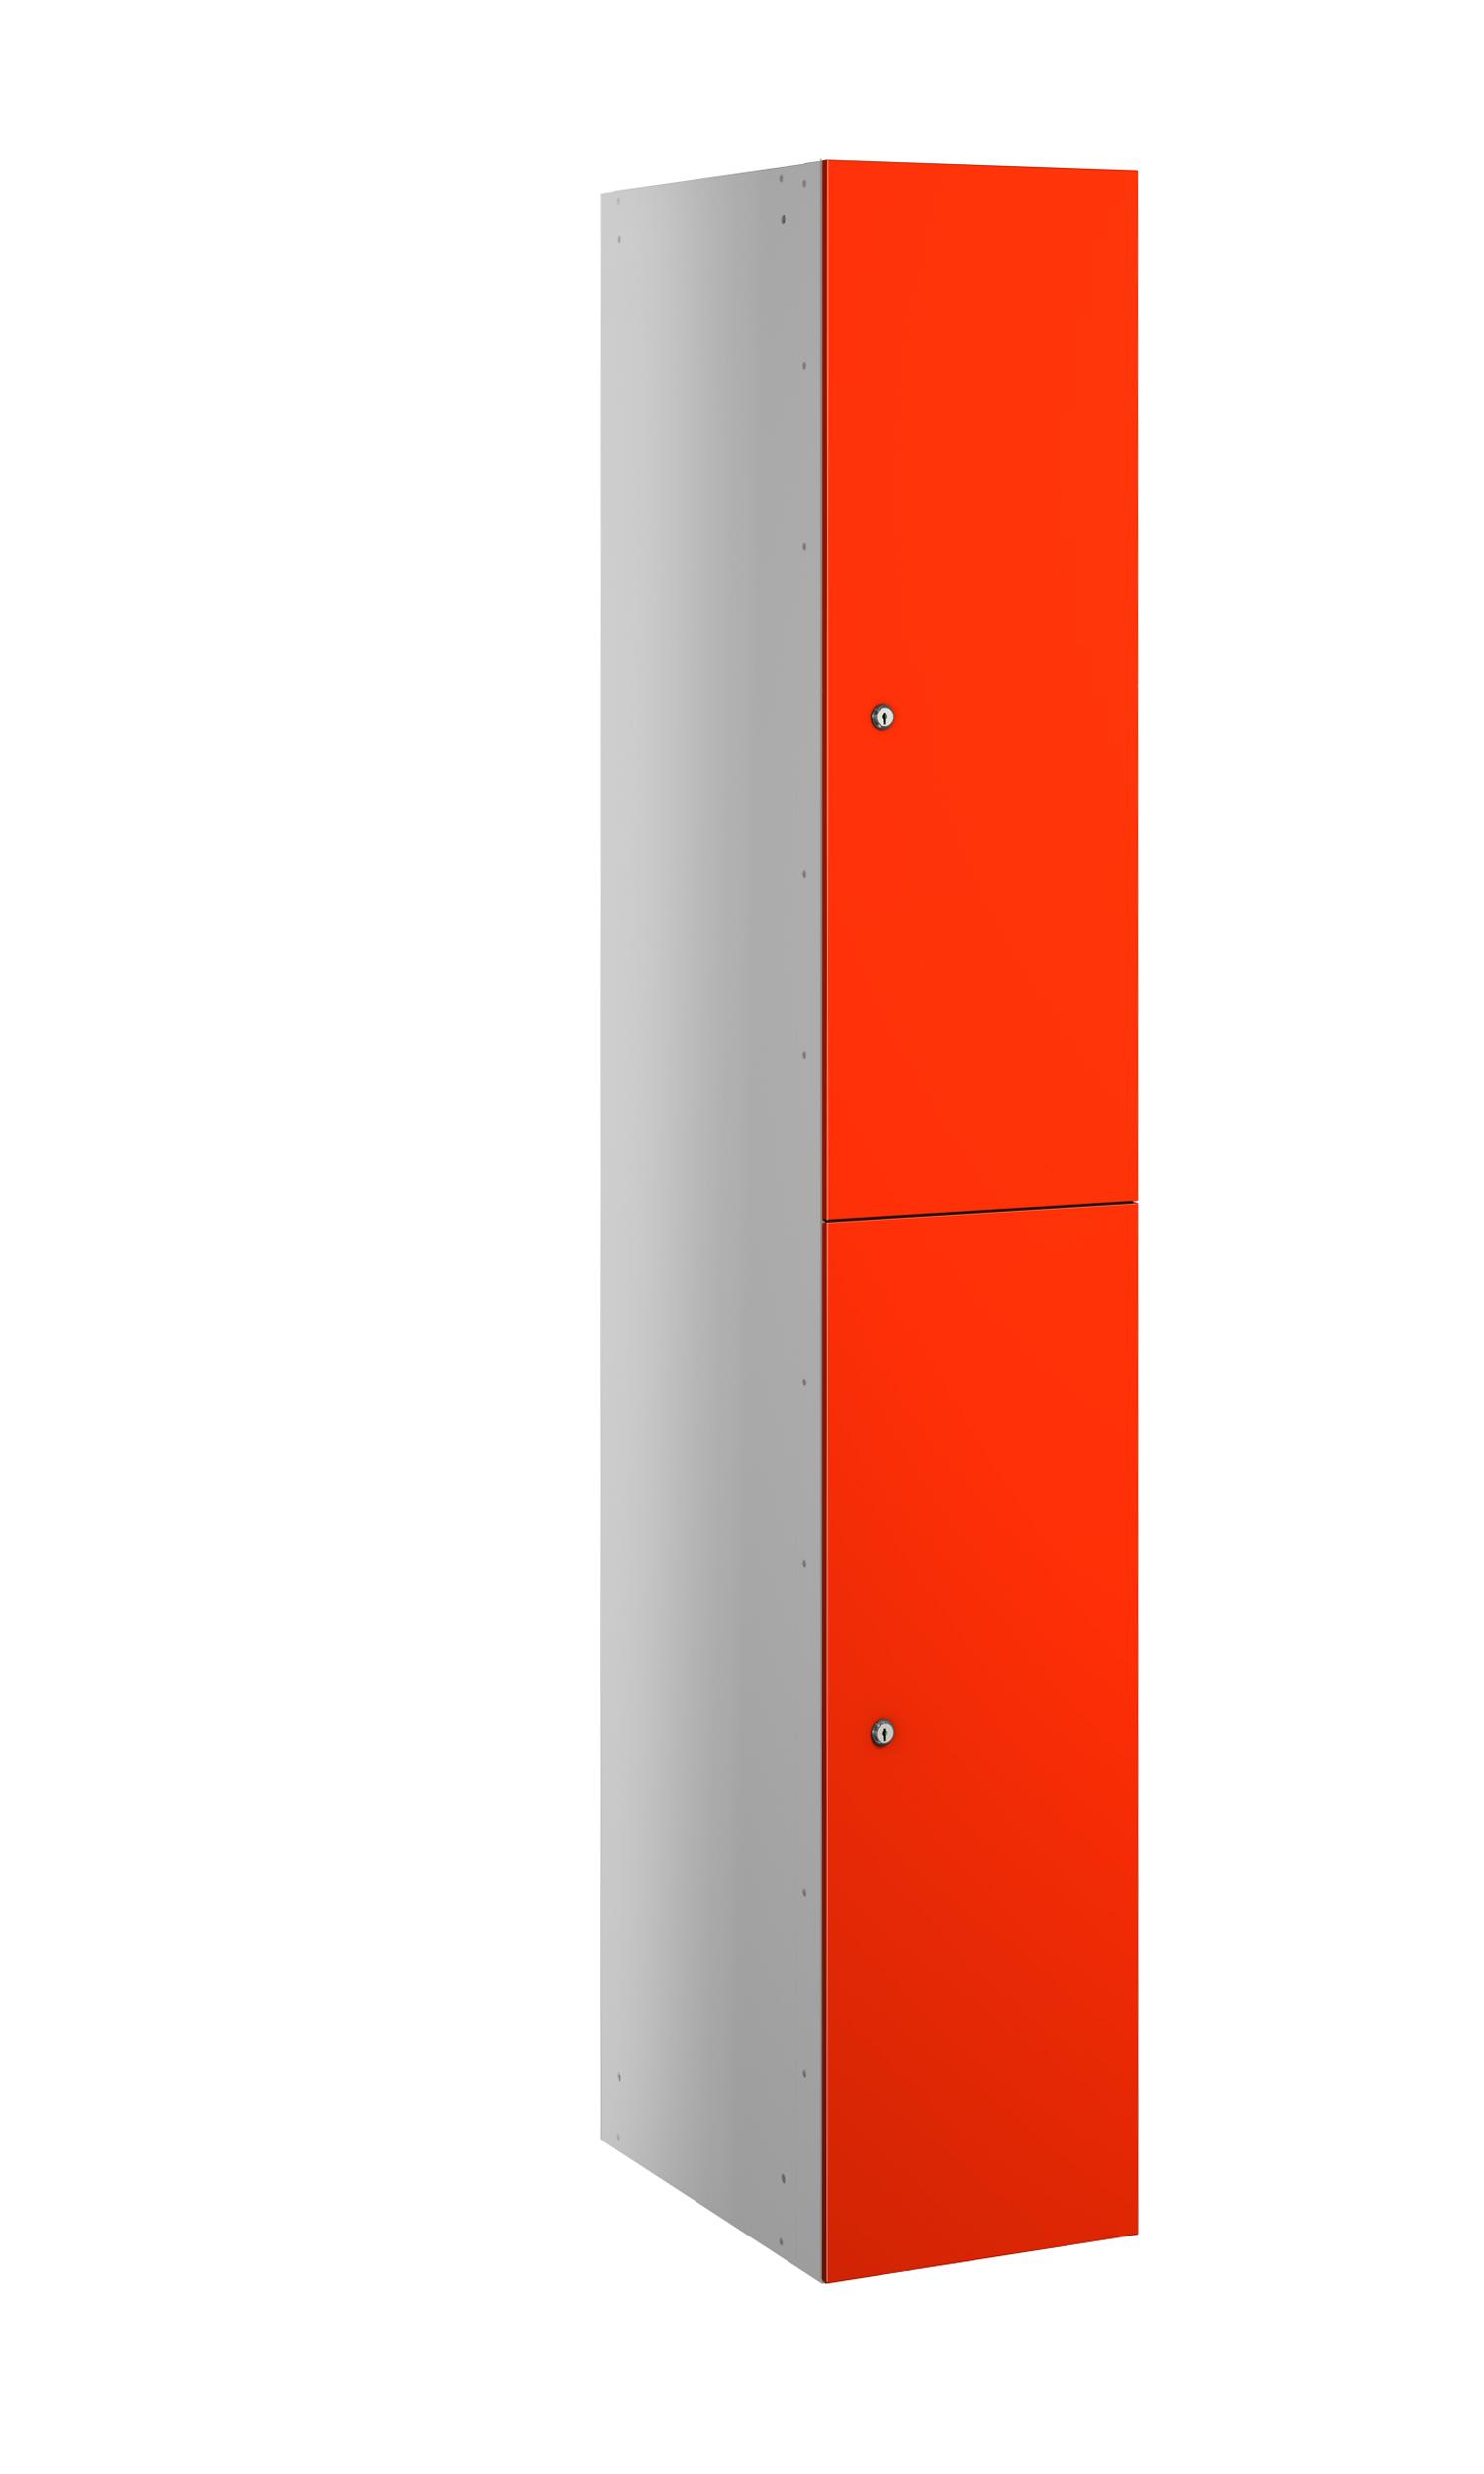 Probe buzzbox laminate 2 doors in orange colour